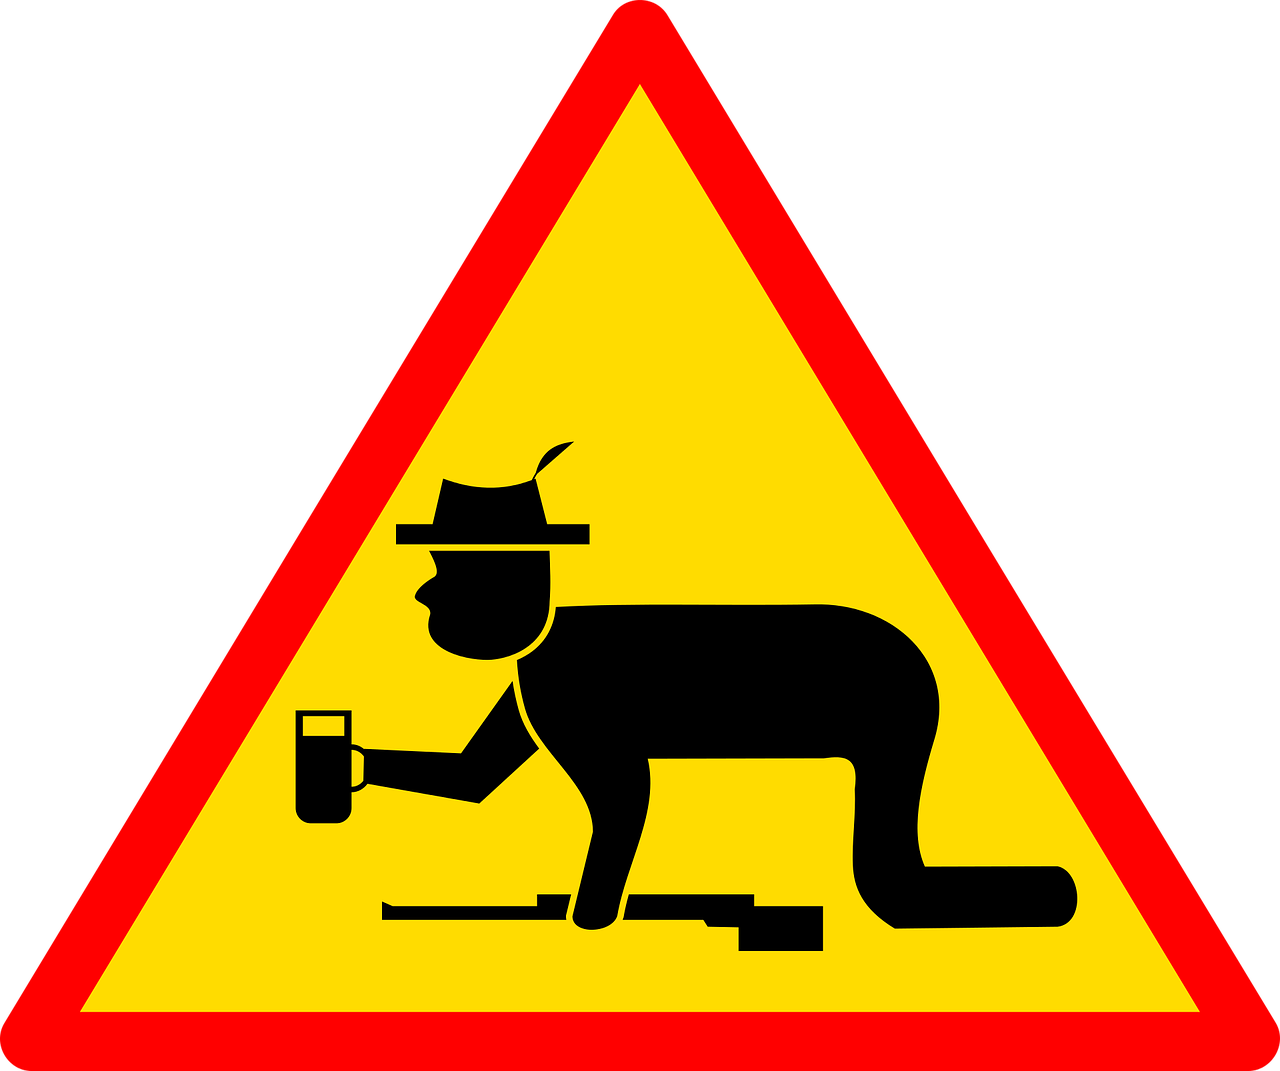 achtung schützenfest sign road free photo